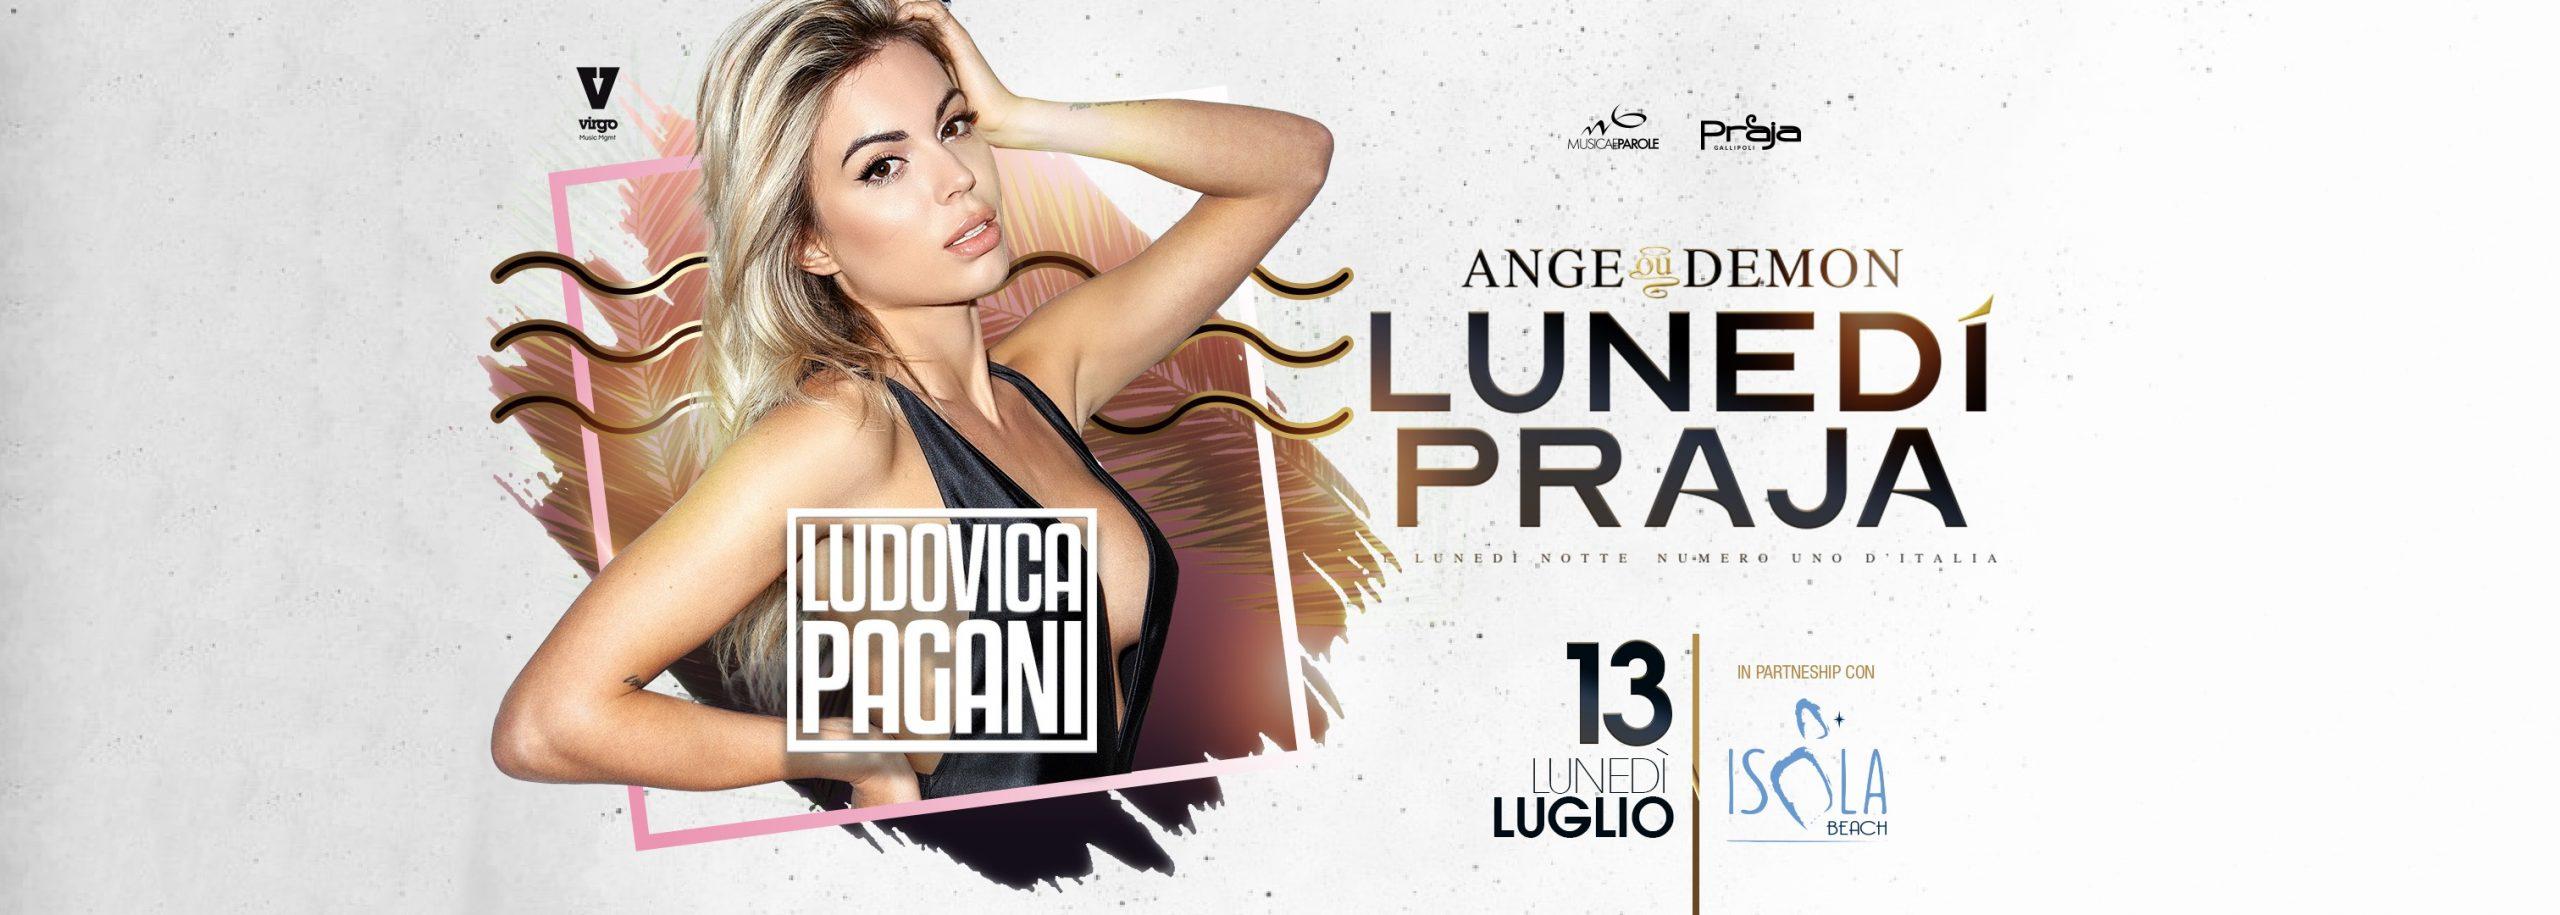 ludovica-pagani-praja-gallipoli-lunedì-13-luglio-1-scaled.jpg